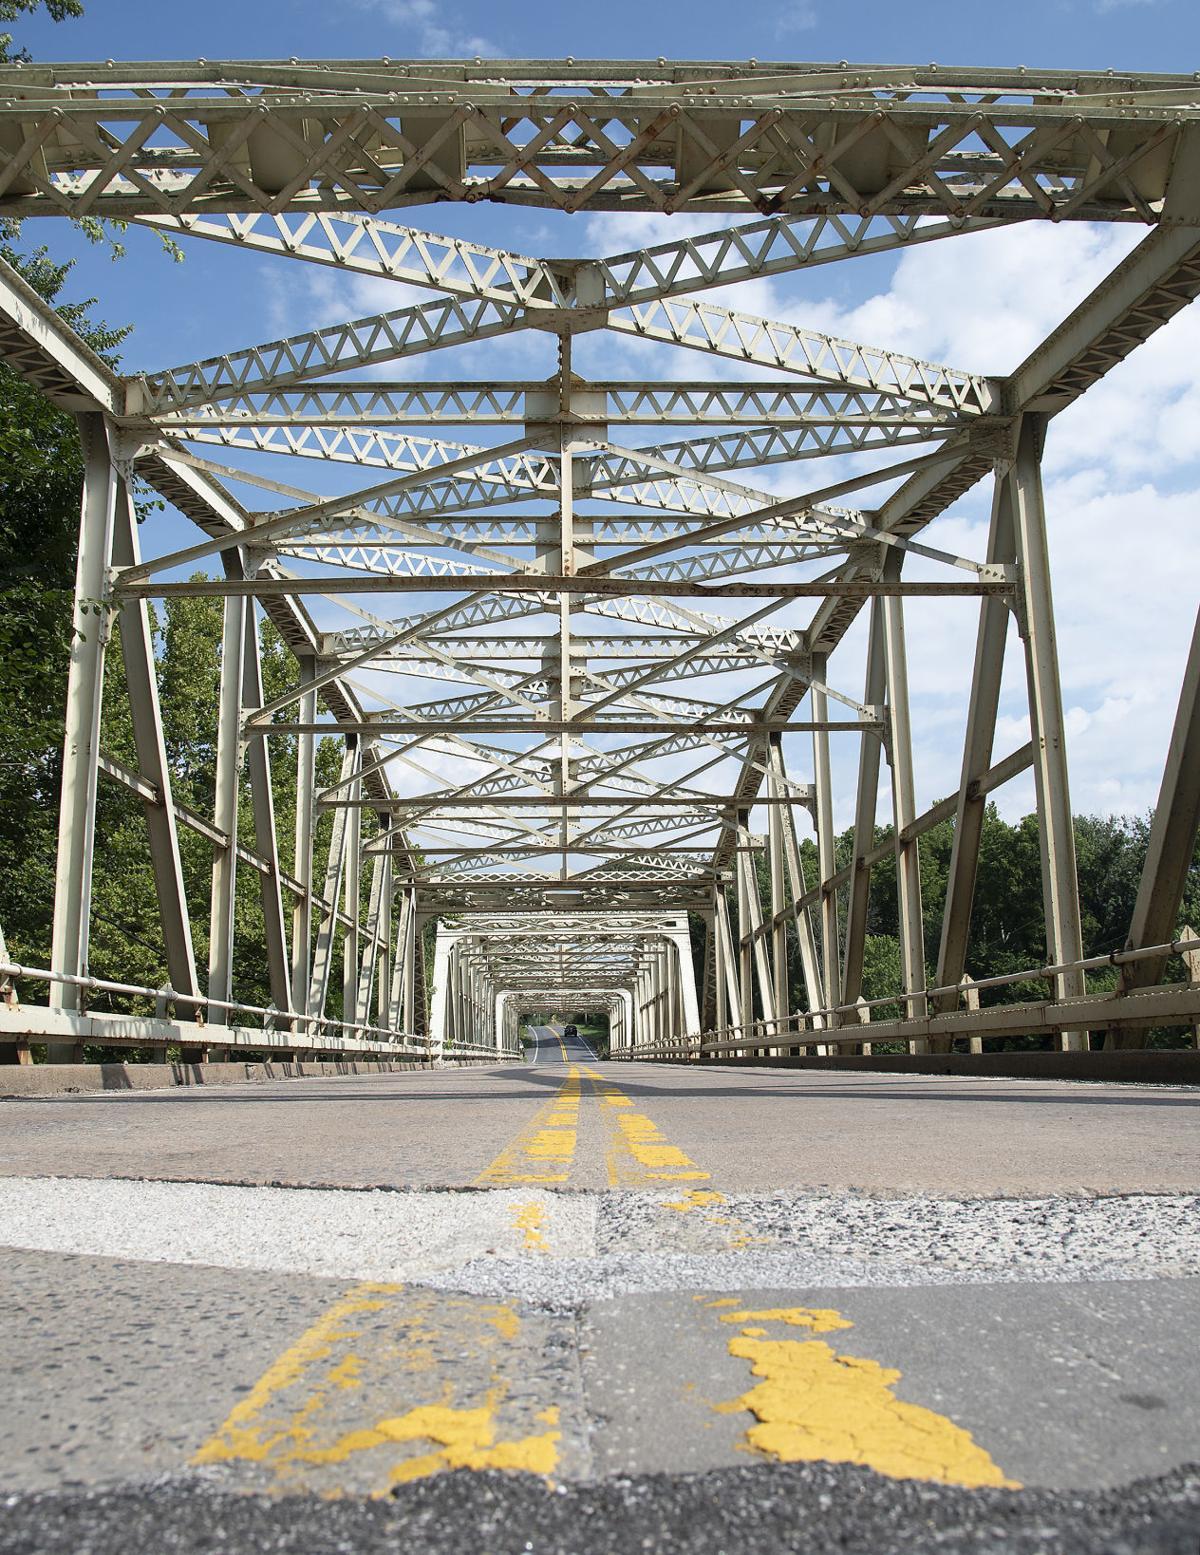 MD 28 bridge over Monocacy River 2